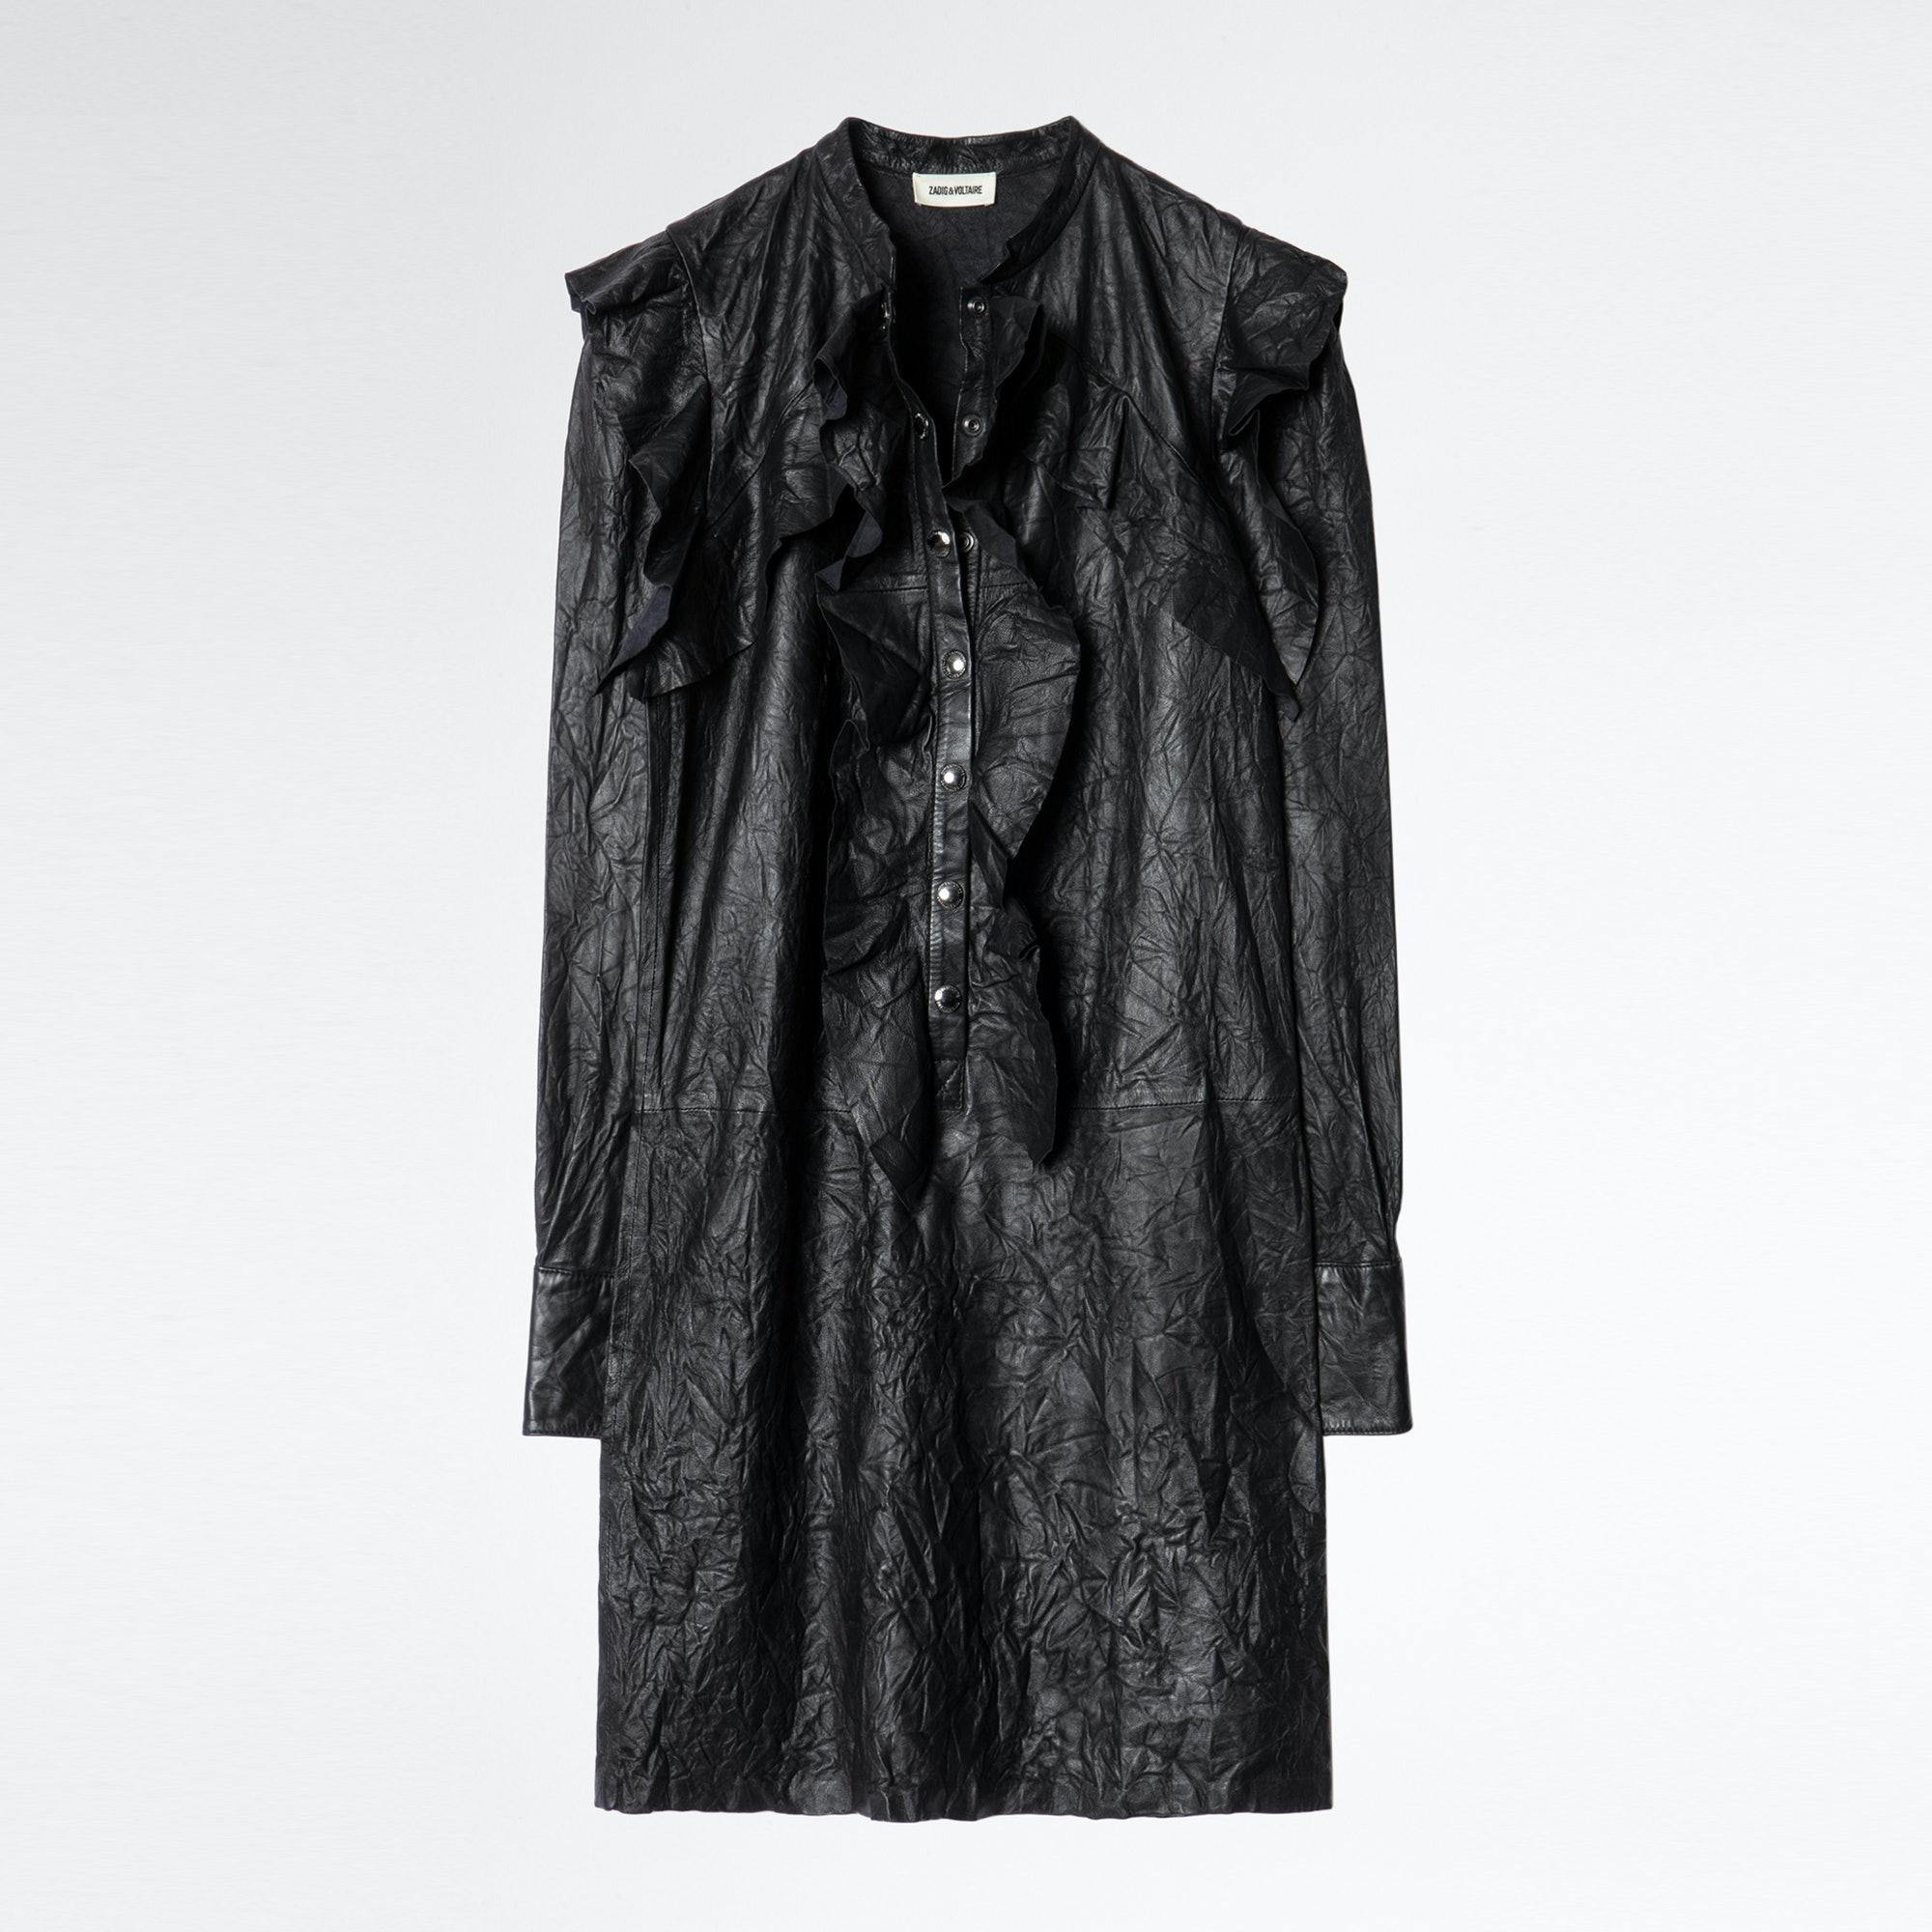 Robe Ruskies Cuir Froissé - Taille 34  - Zadig & Voltaire - Modalova